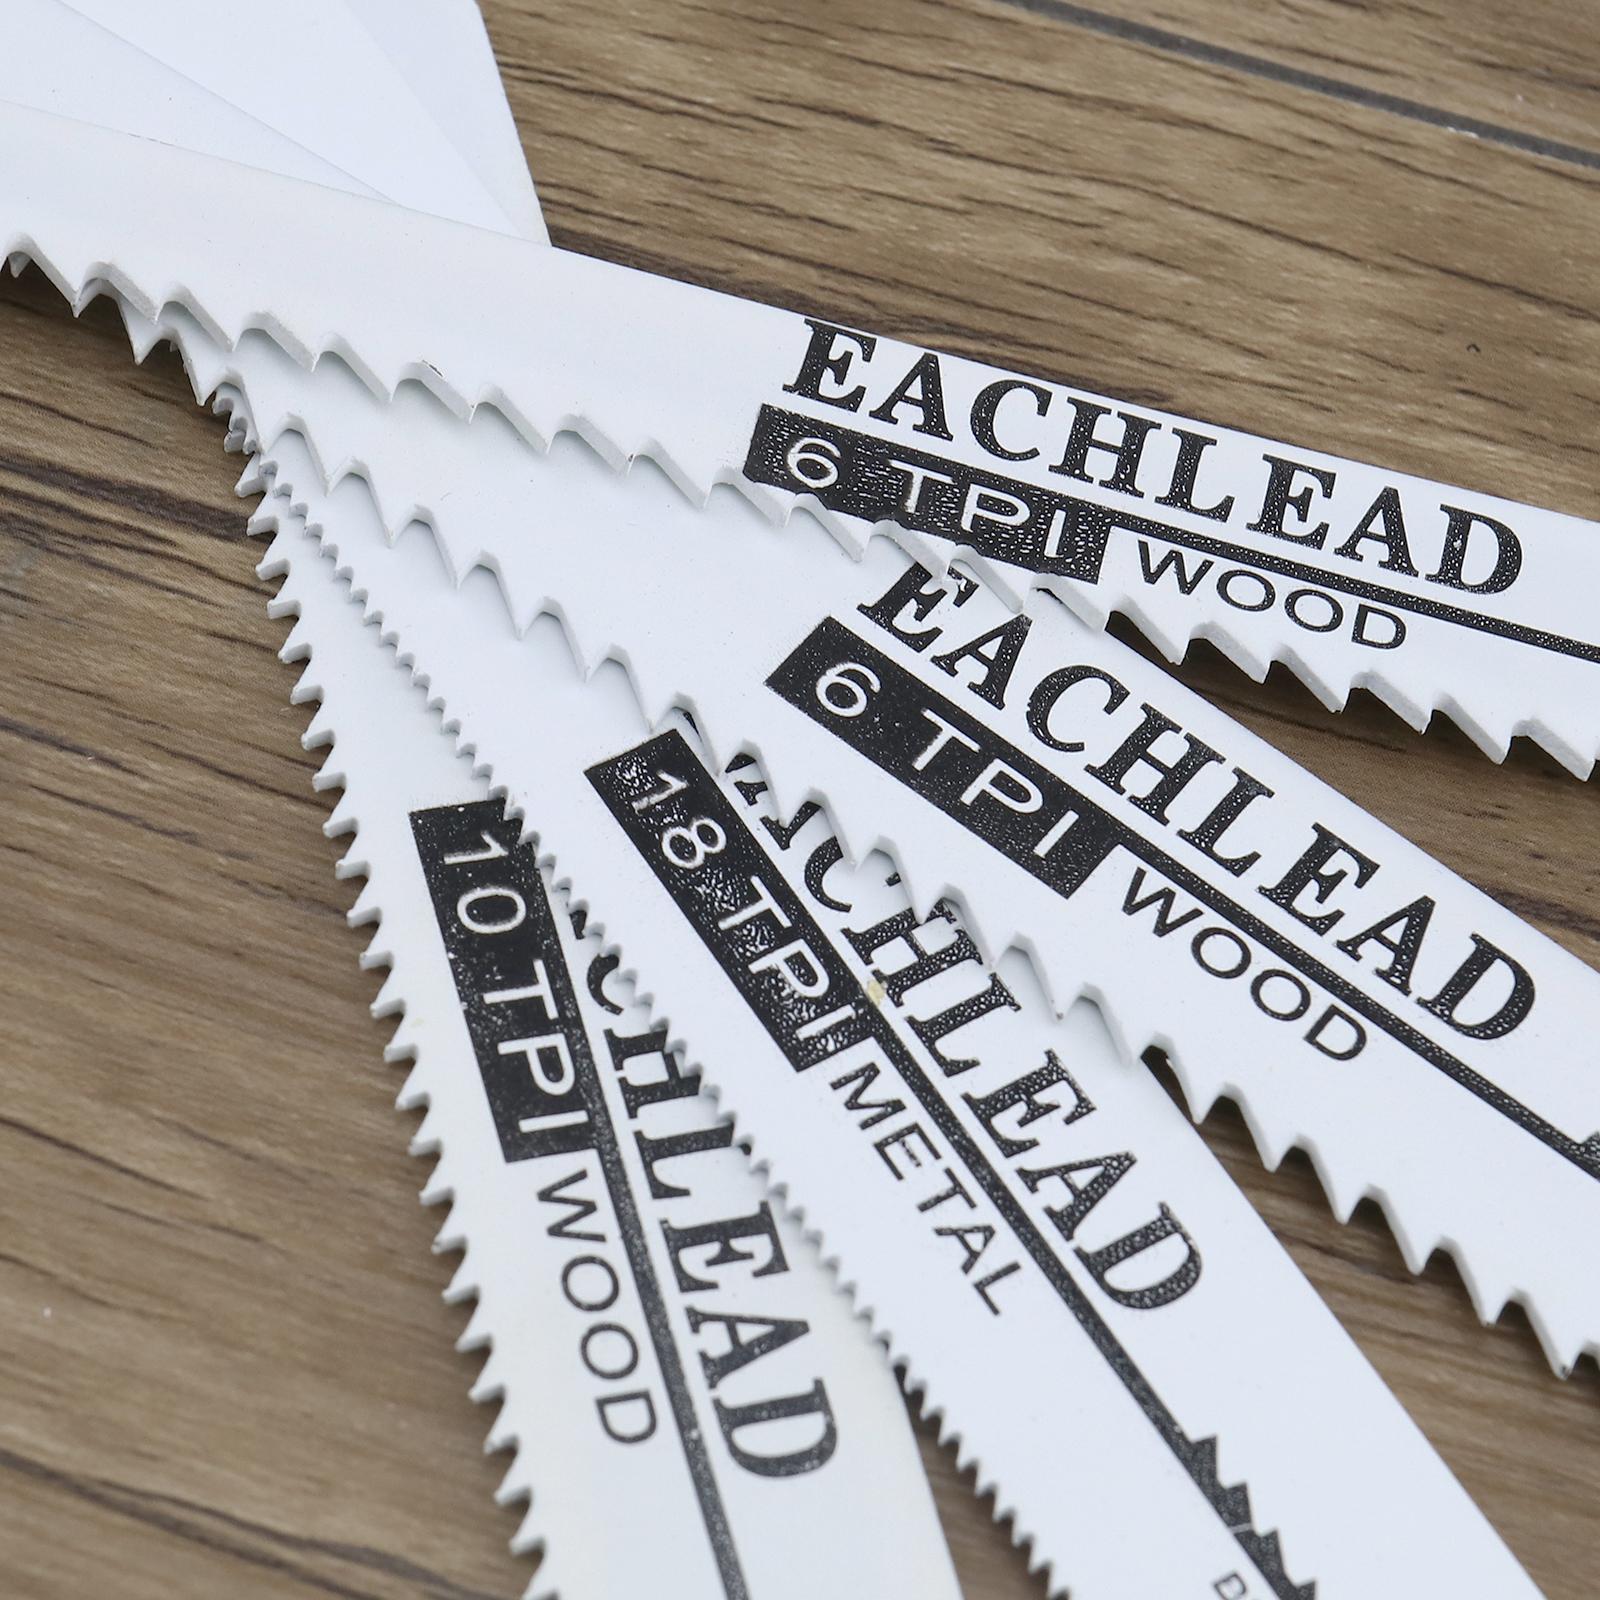 10 Pcs Reciprocating Saw Blades Set Wood Metal Timber Demolition Cutting Set